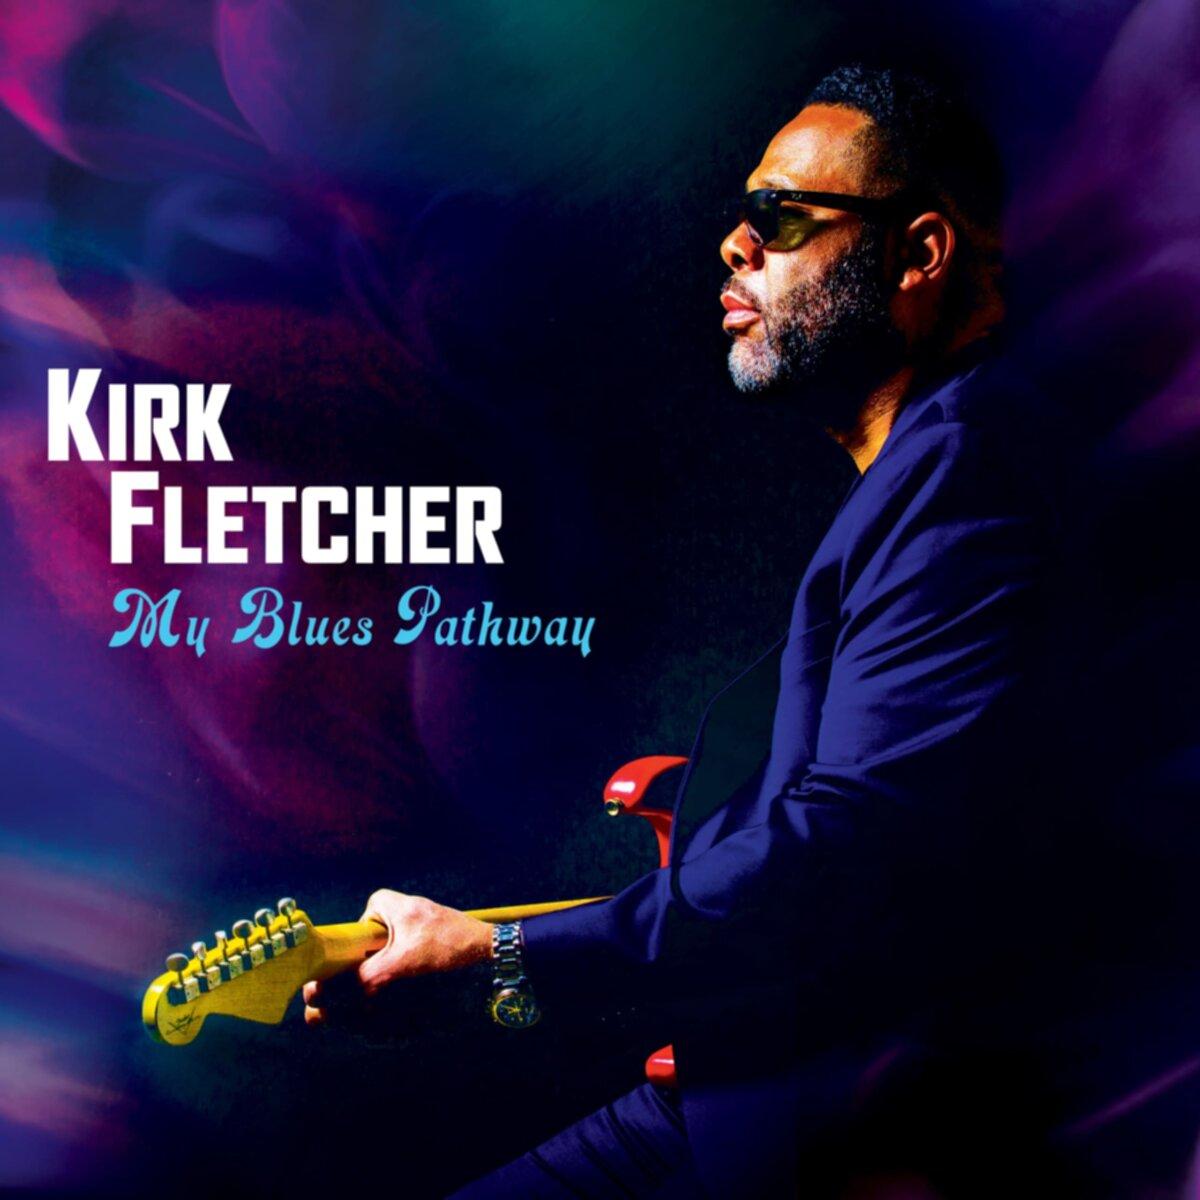 Kirk Fletcher My Blues Pathway